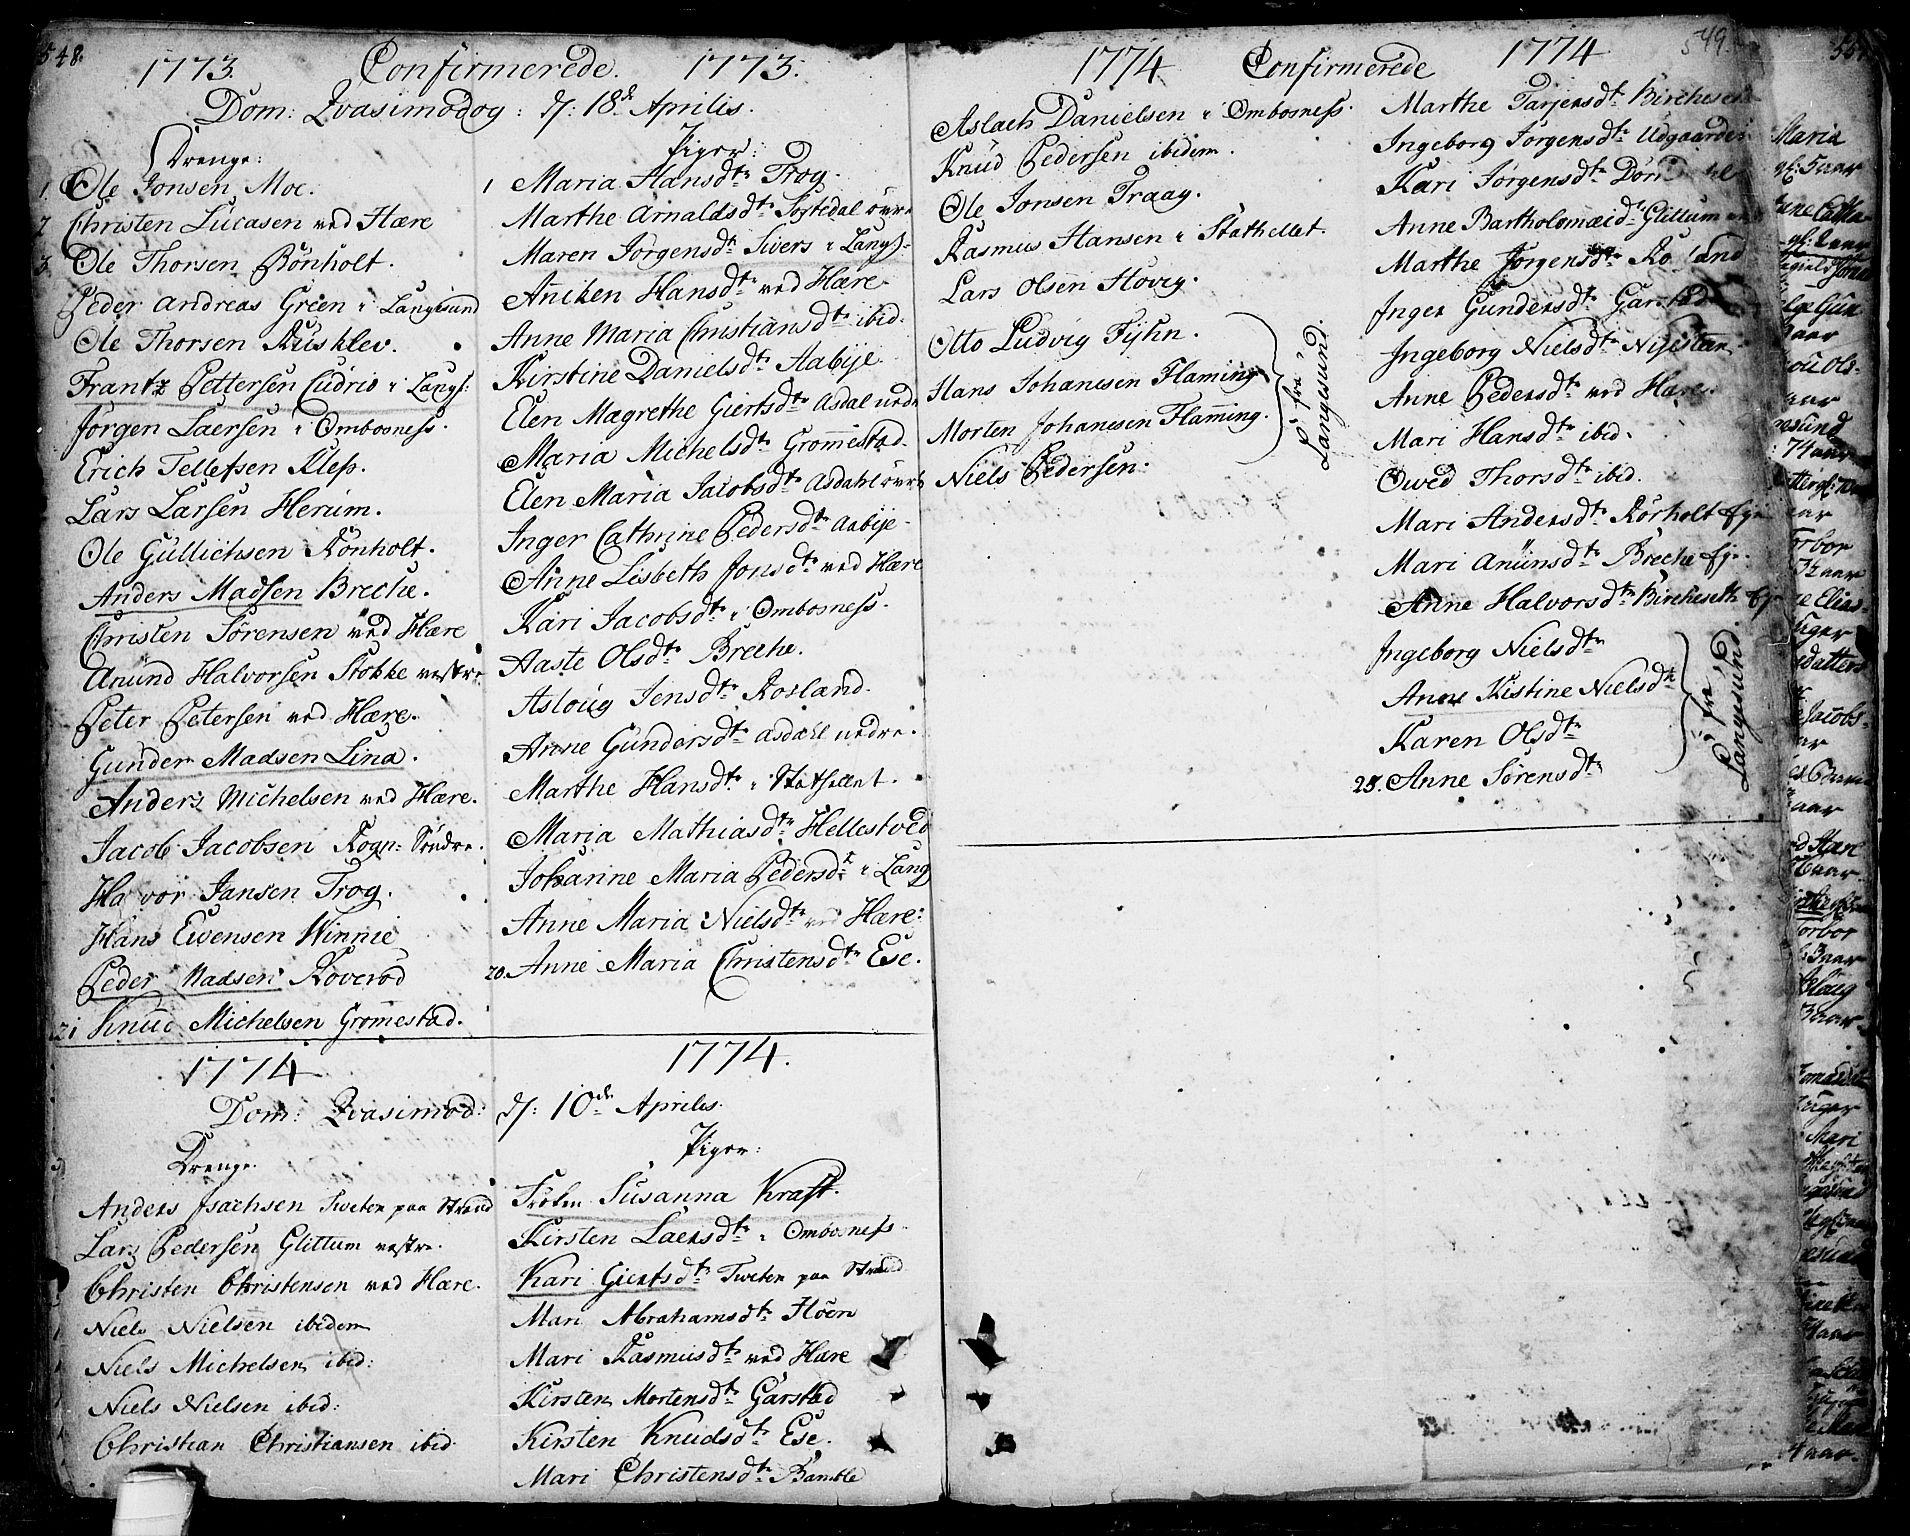 SAKO, Bamble kirkebøker, F/Fa/L0001: Ministerialbok nr. I 1, 1702-1774, s. 548-549